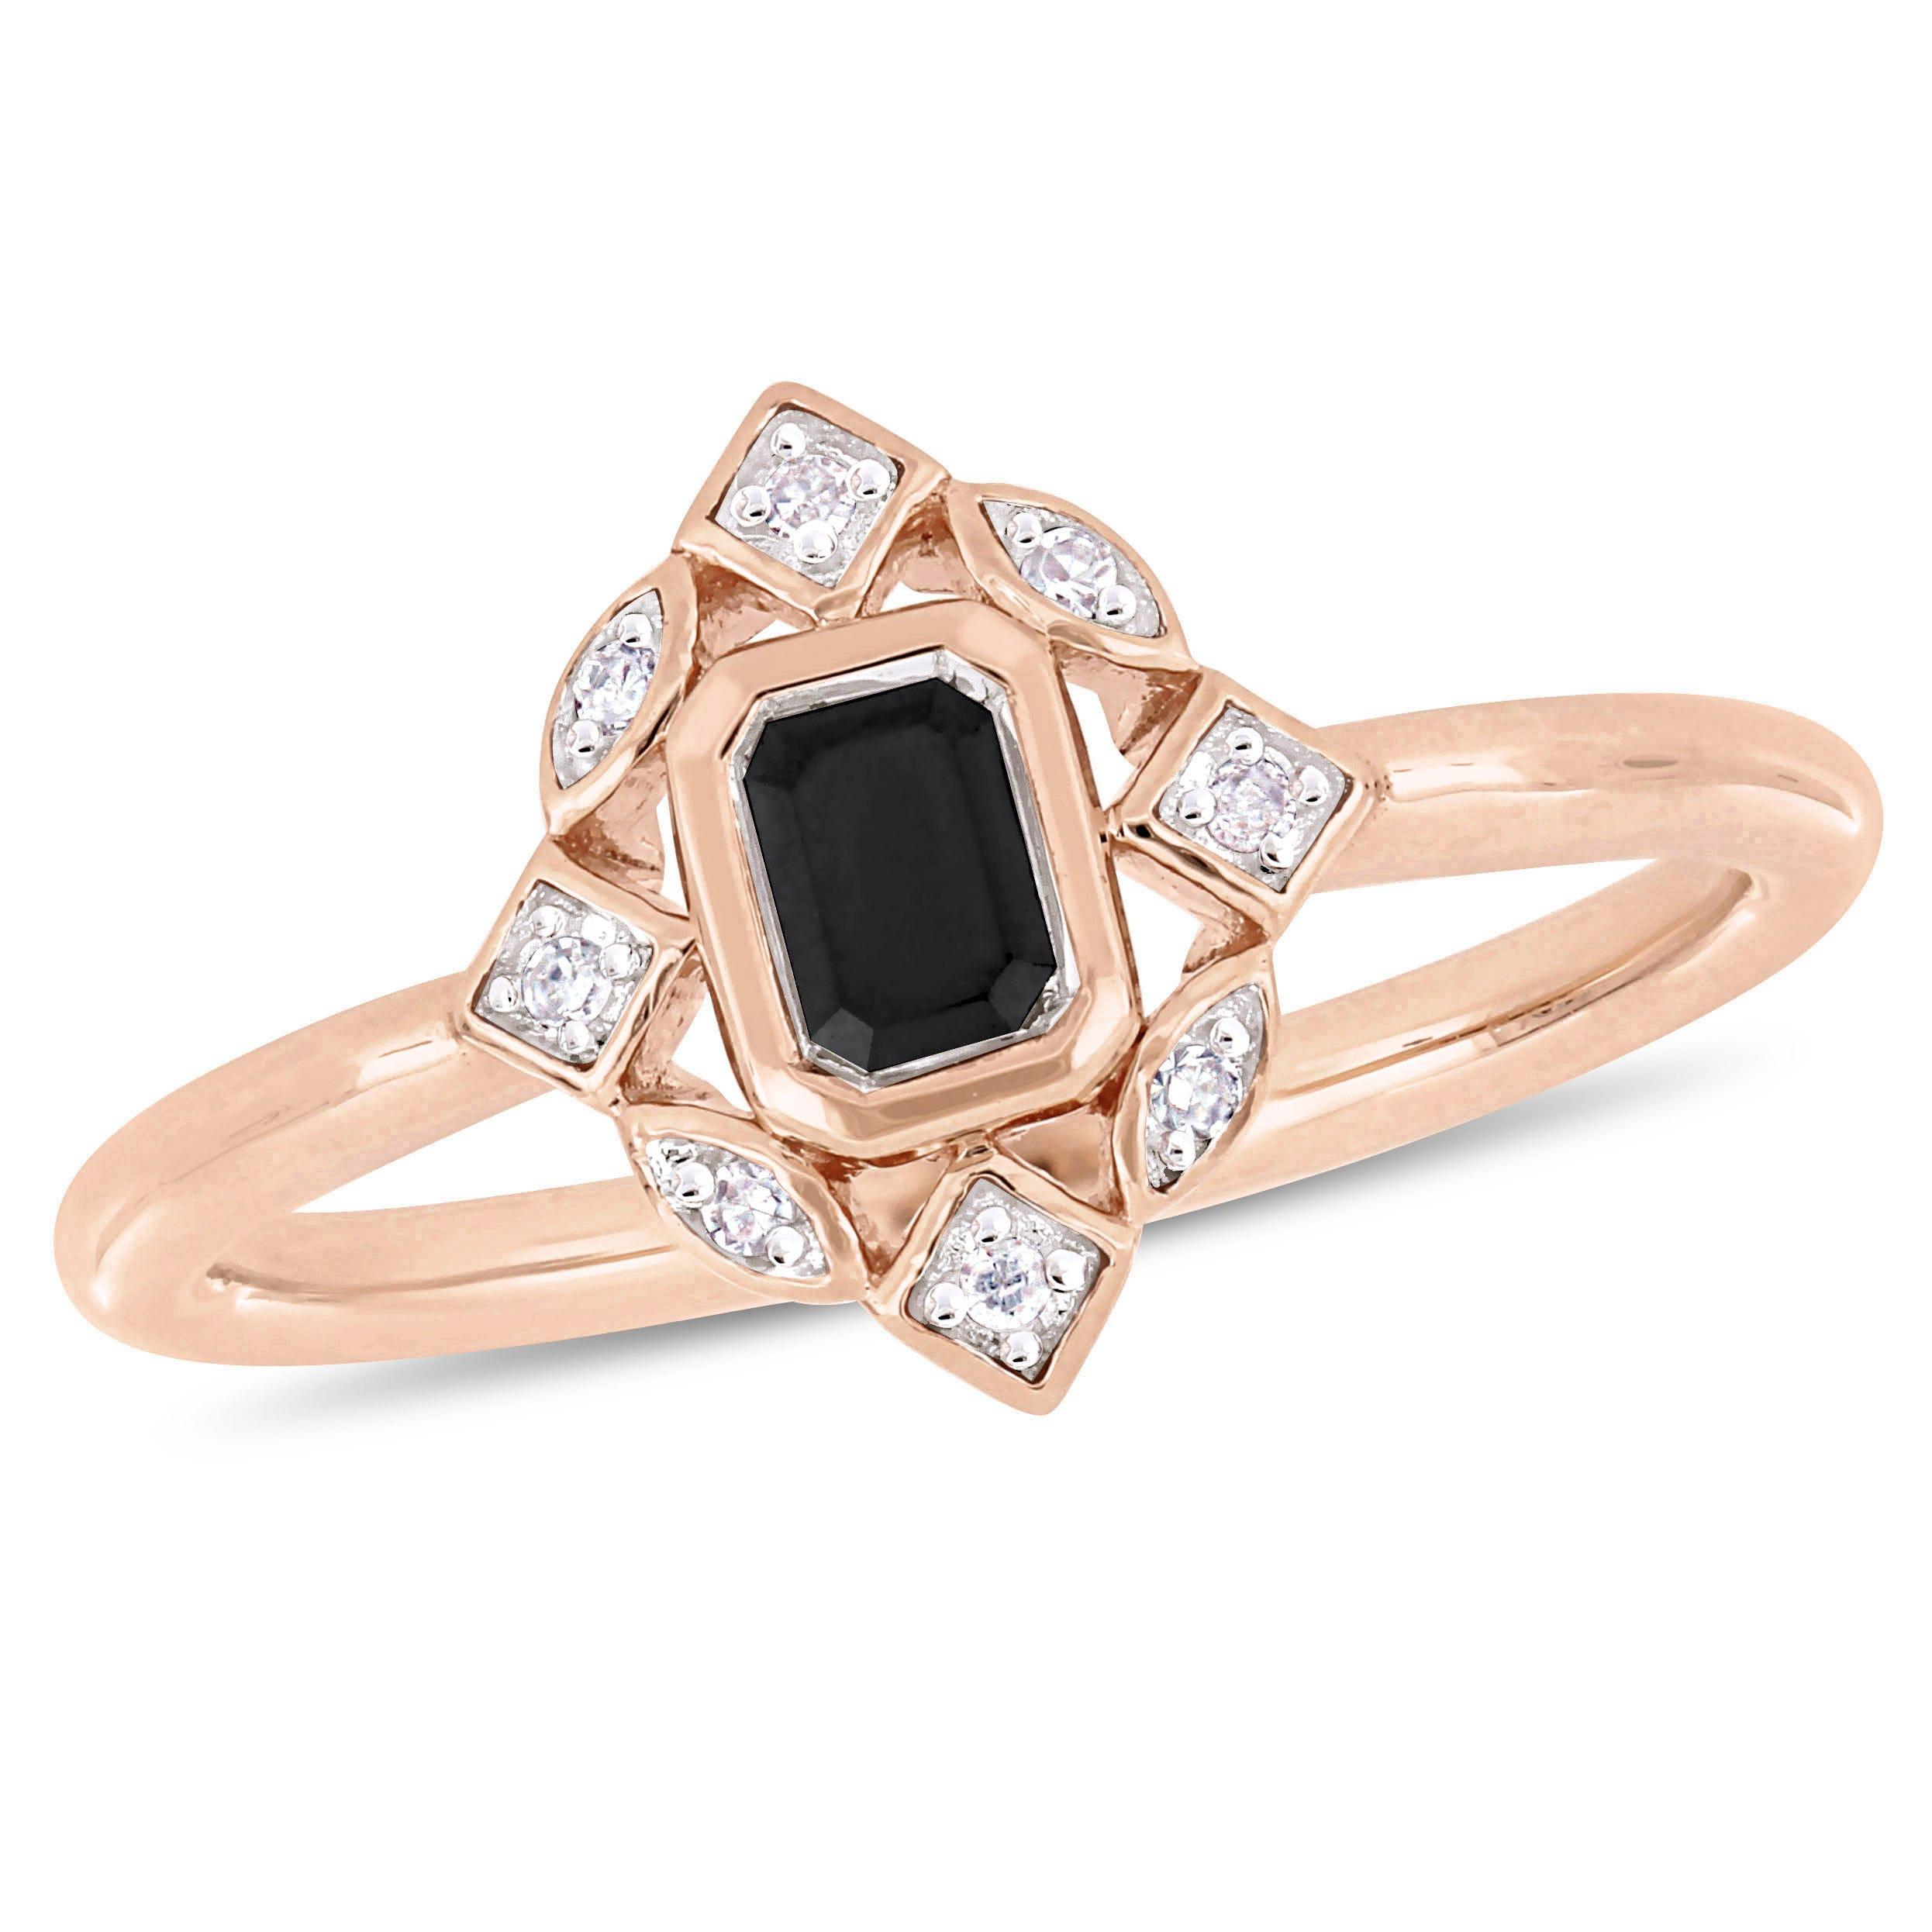 Everly Black Emerald-Cut & White Diamond Fashion Ring in 10k Rose Gold